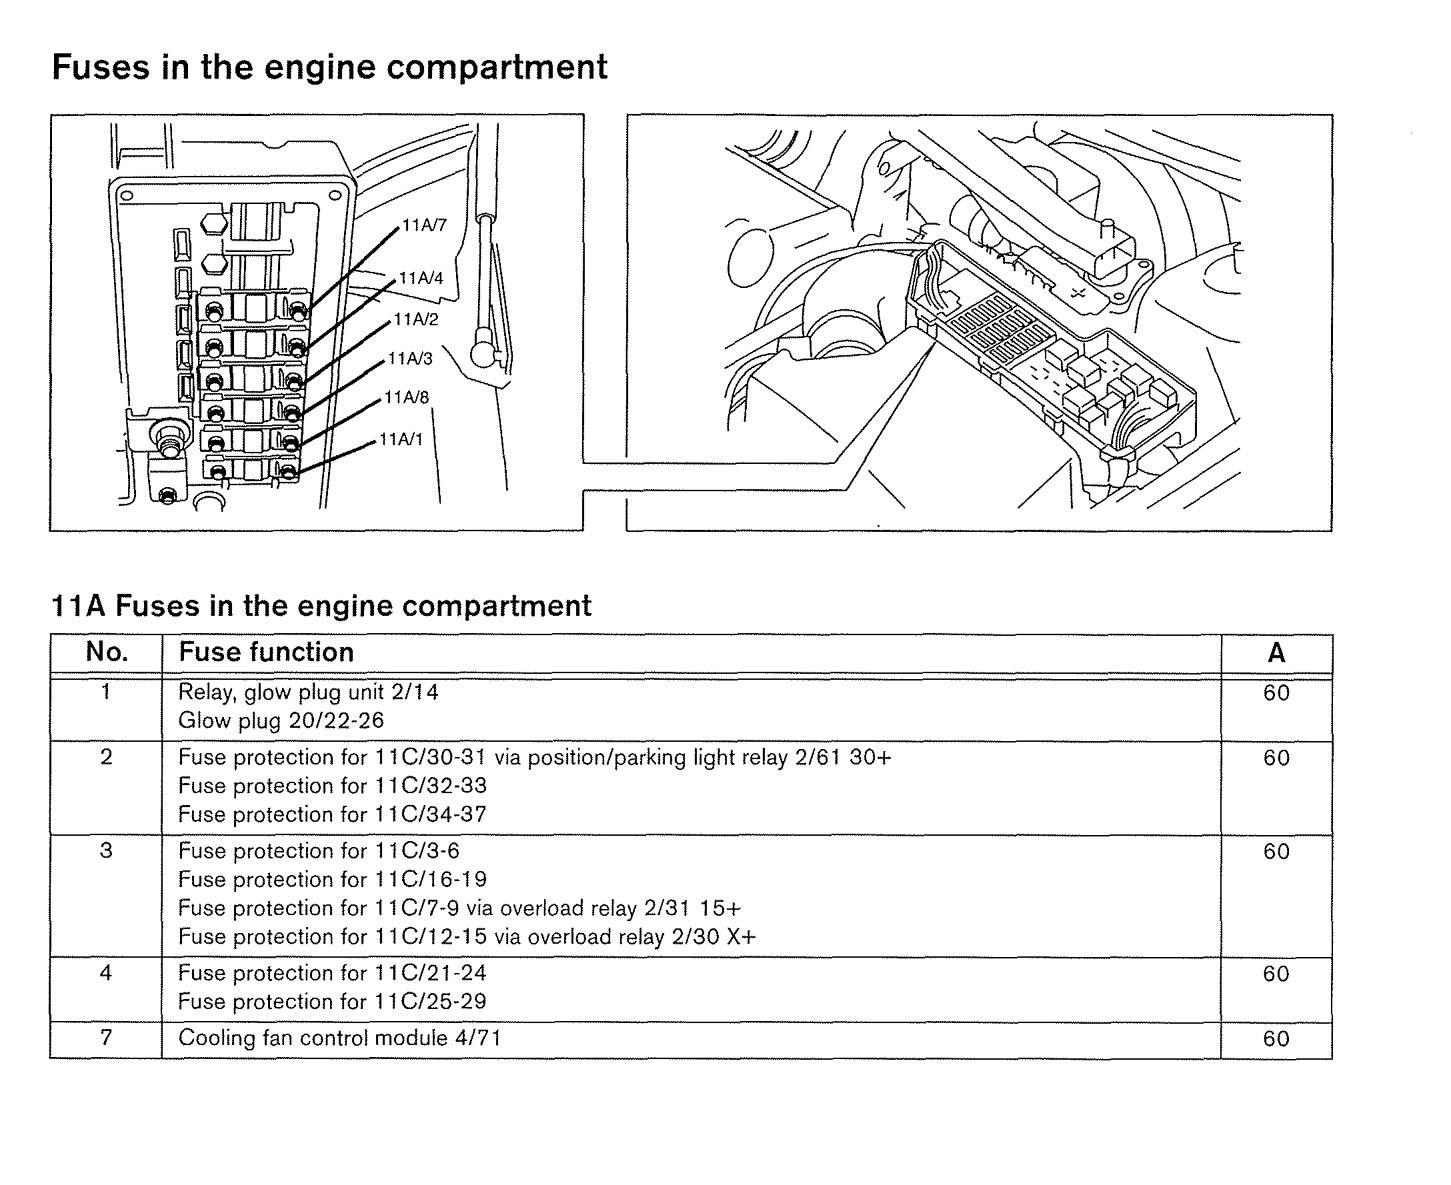 2002 Fleetwood Discovery Wiring Schematics